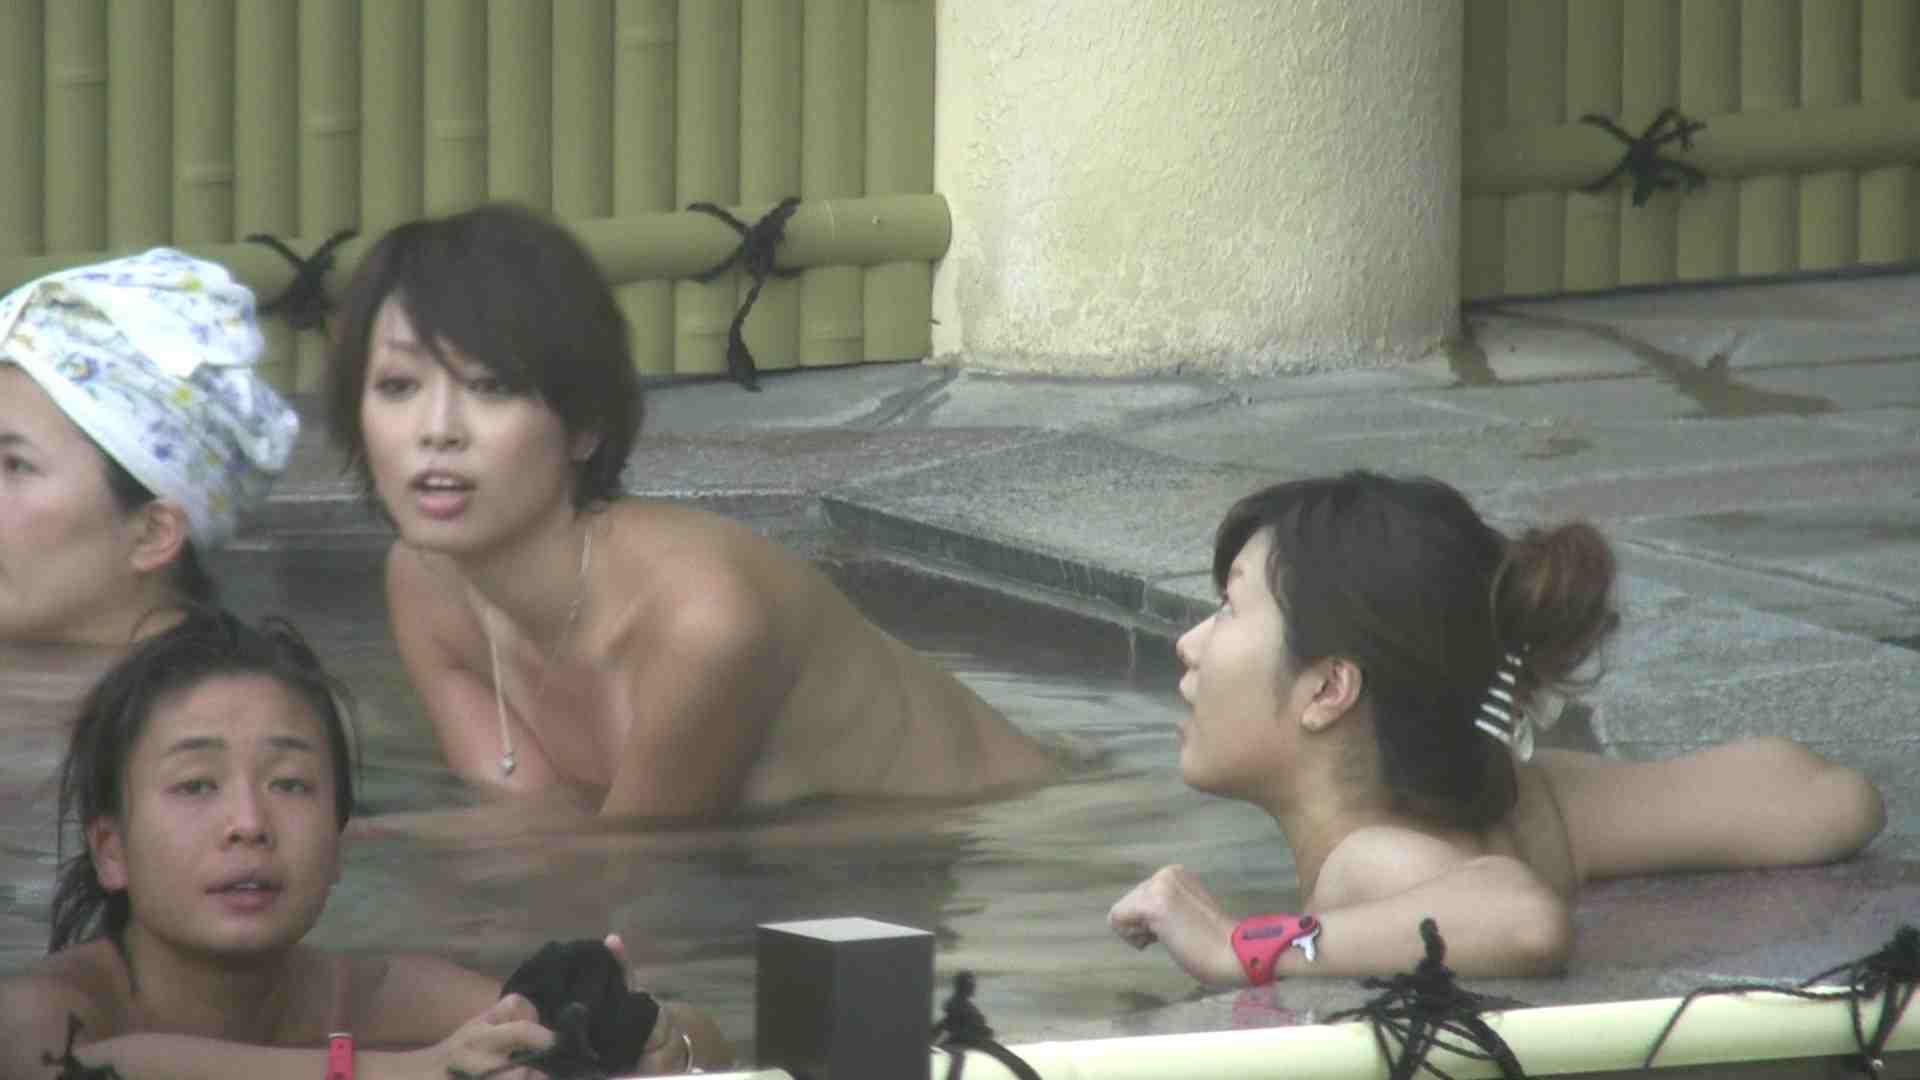 Aquaな露天風呂Vol.201 露天風呂編  102PIX 2